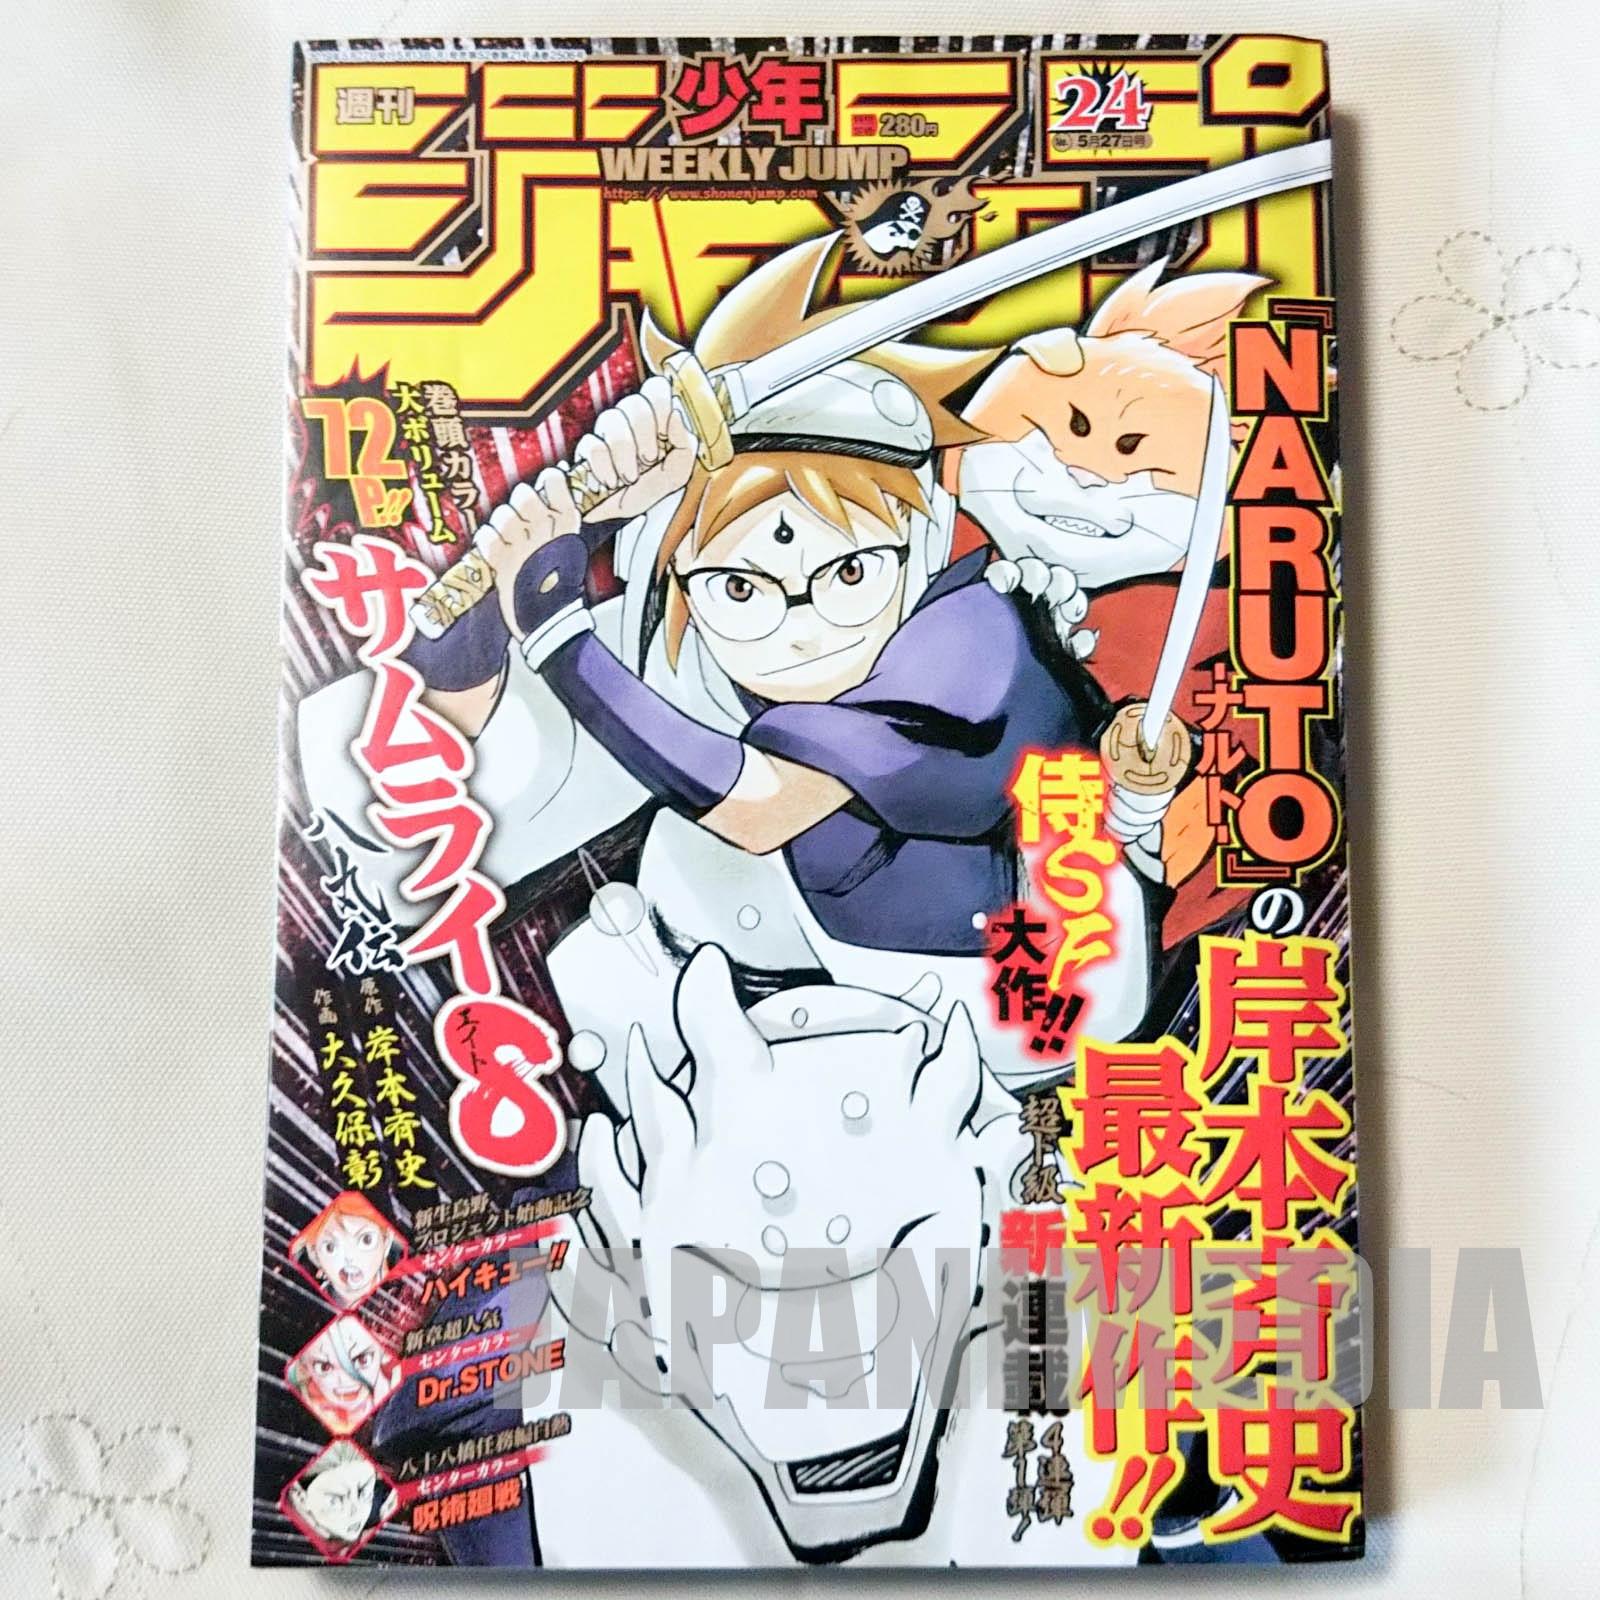 Weekly Shonen JUMP  Vol.24 2019 Samurai 8: The Tale of Hachimaru / Japanese Magazine JAPAN MANGA